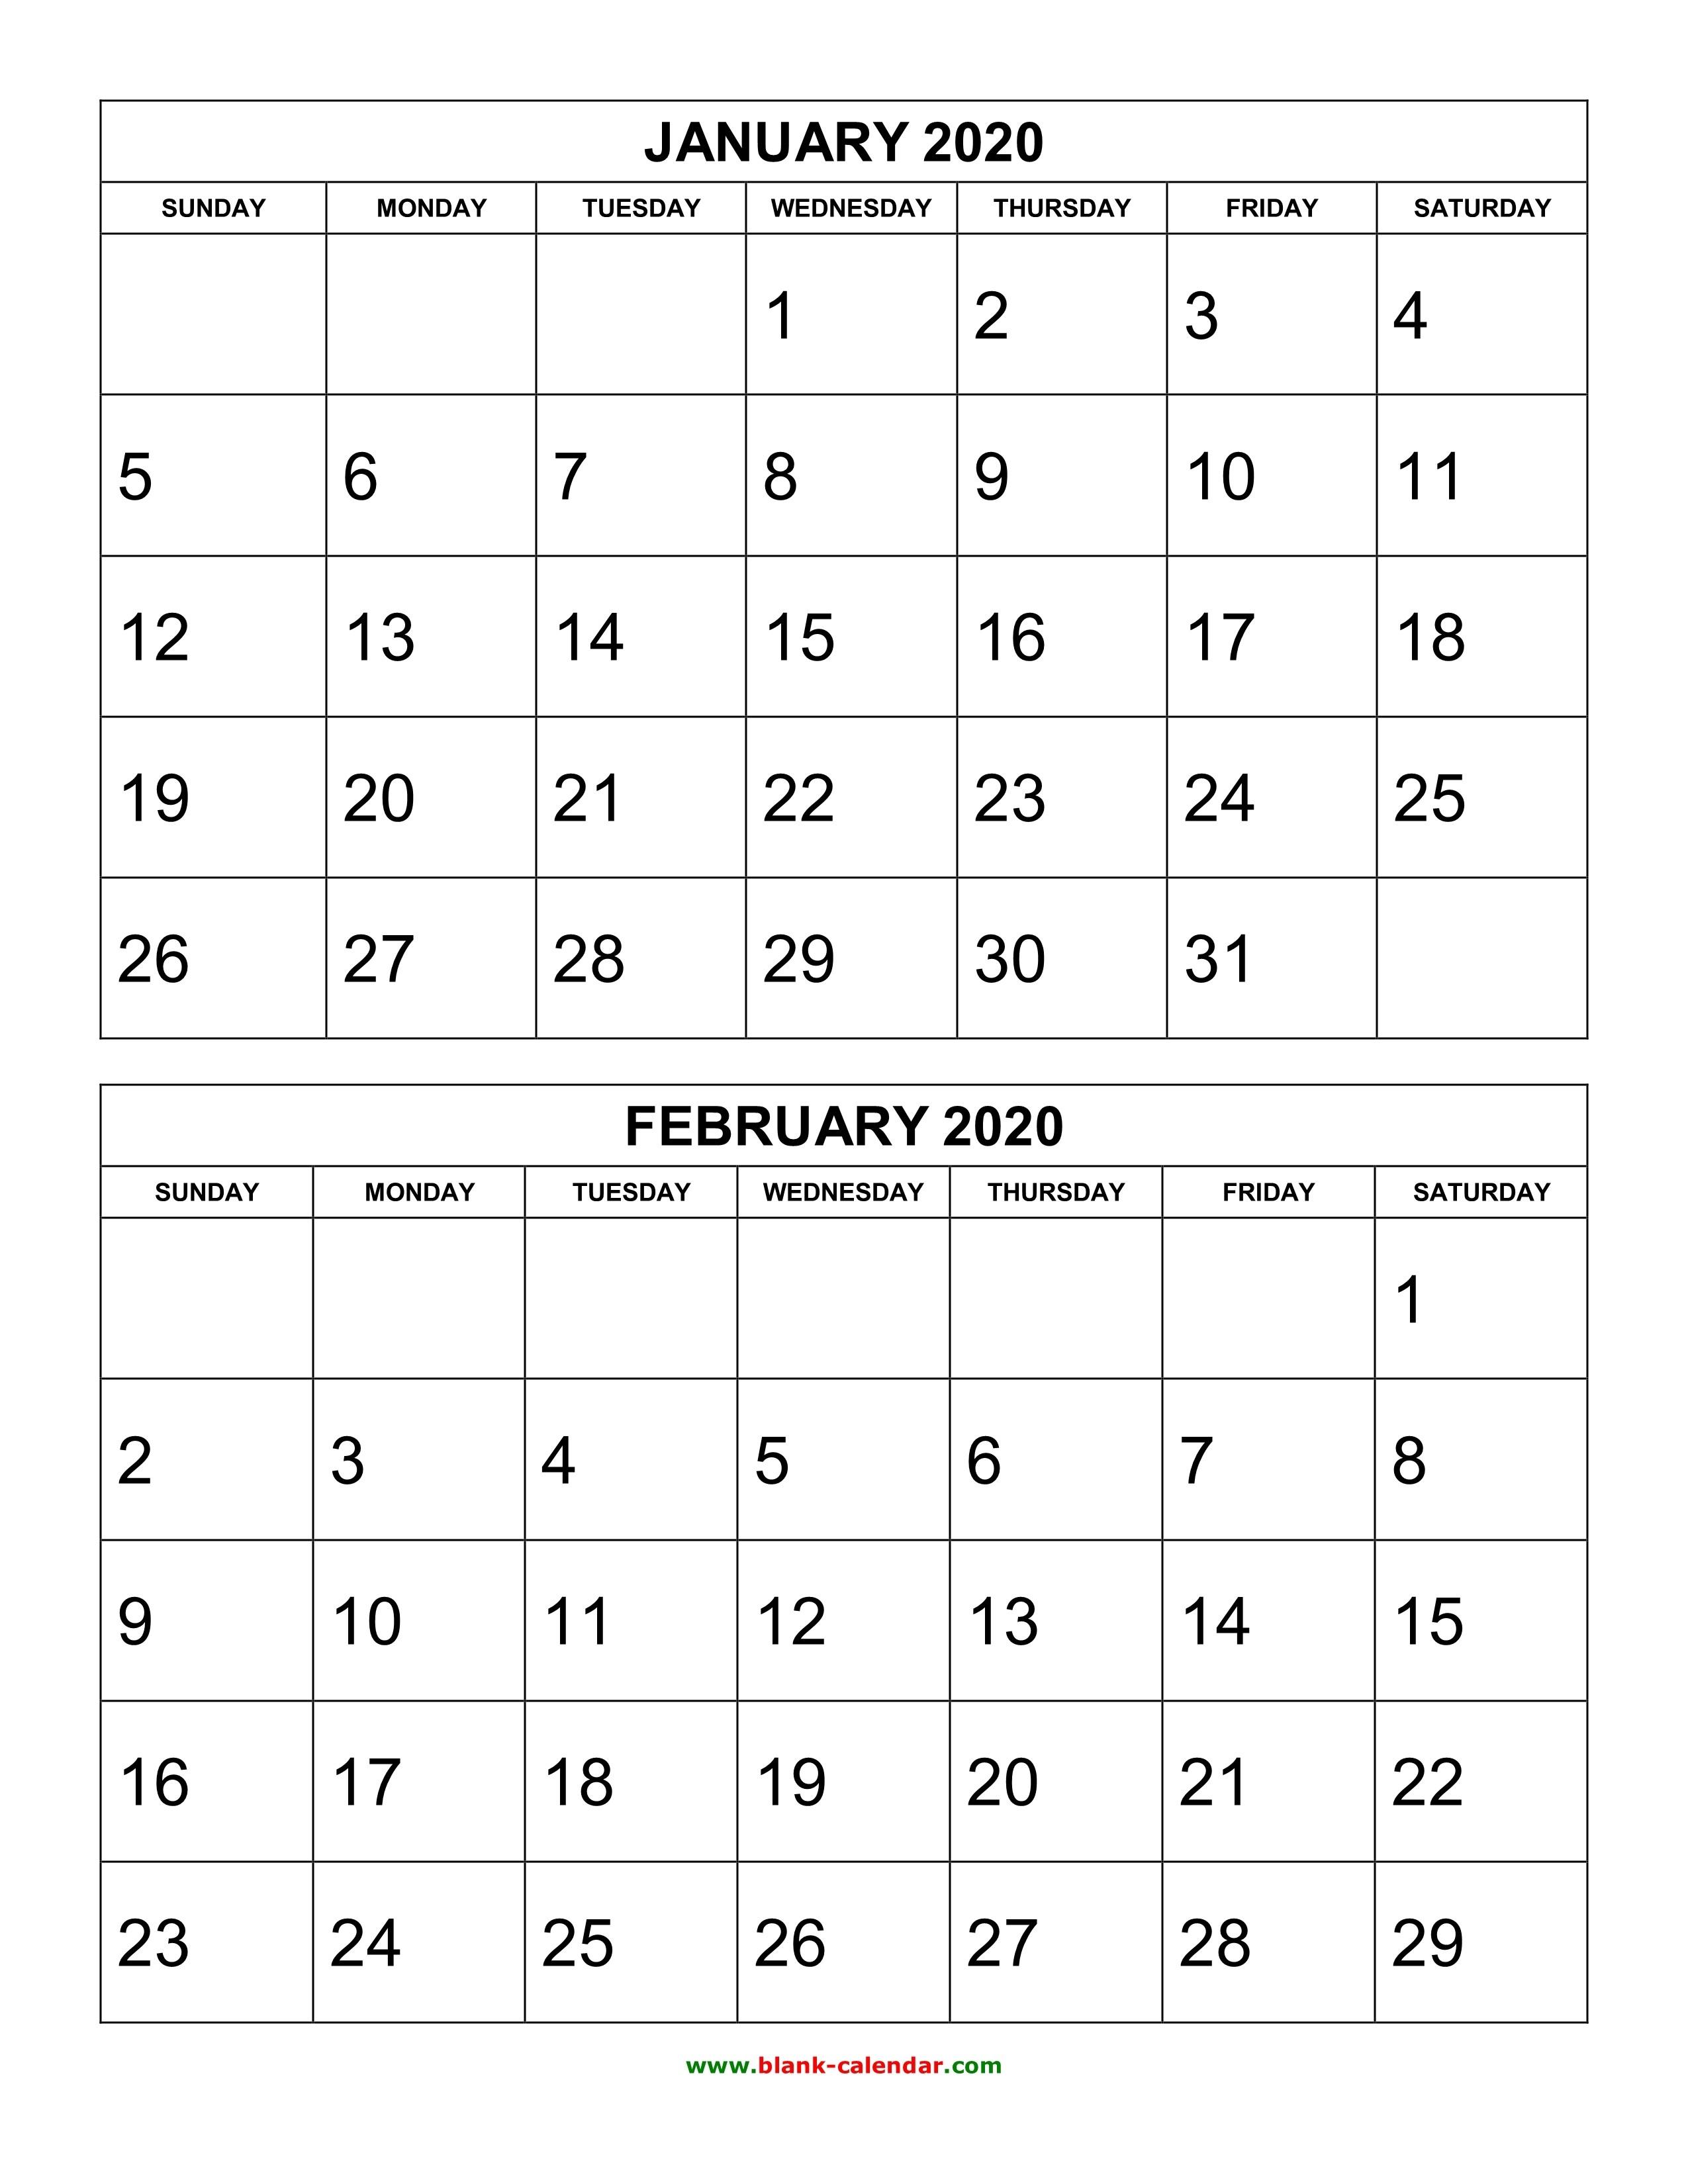 Free Download Printable Calendar 2020, 2 Months Per Page, 6-Calendar Templates 3 Months Per Page 2020